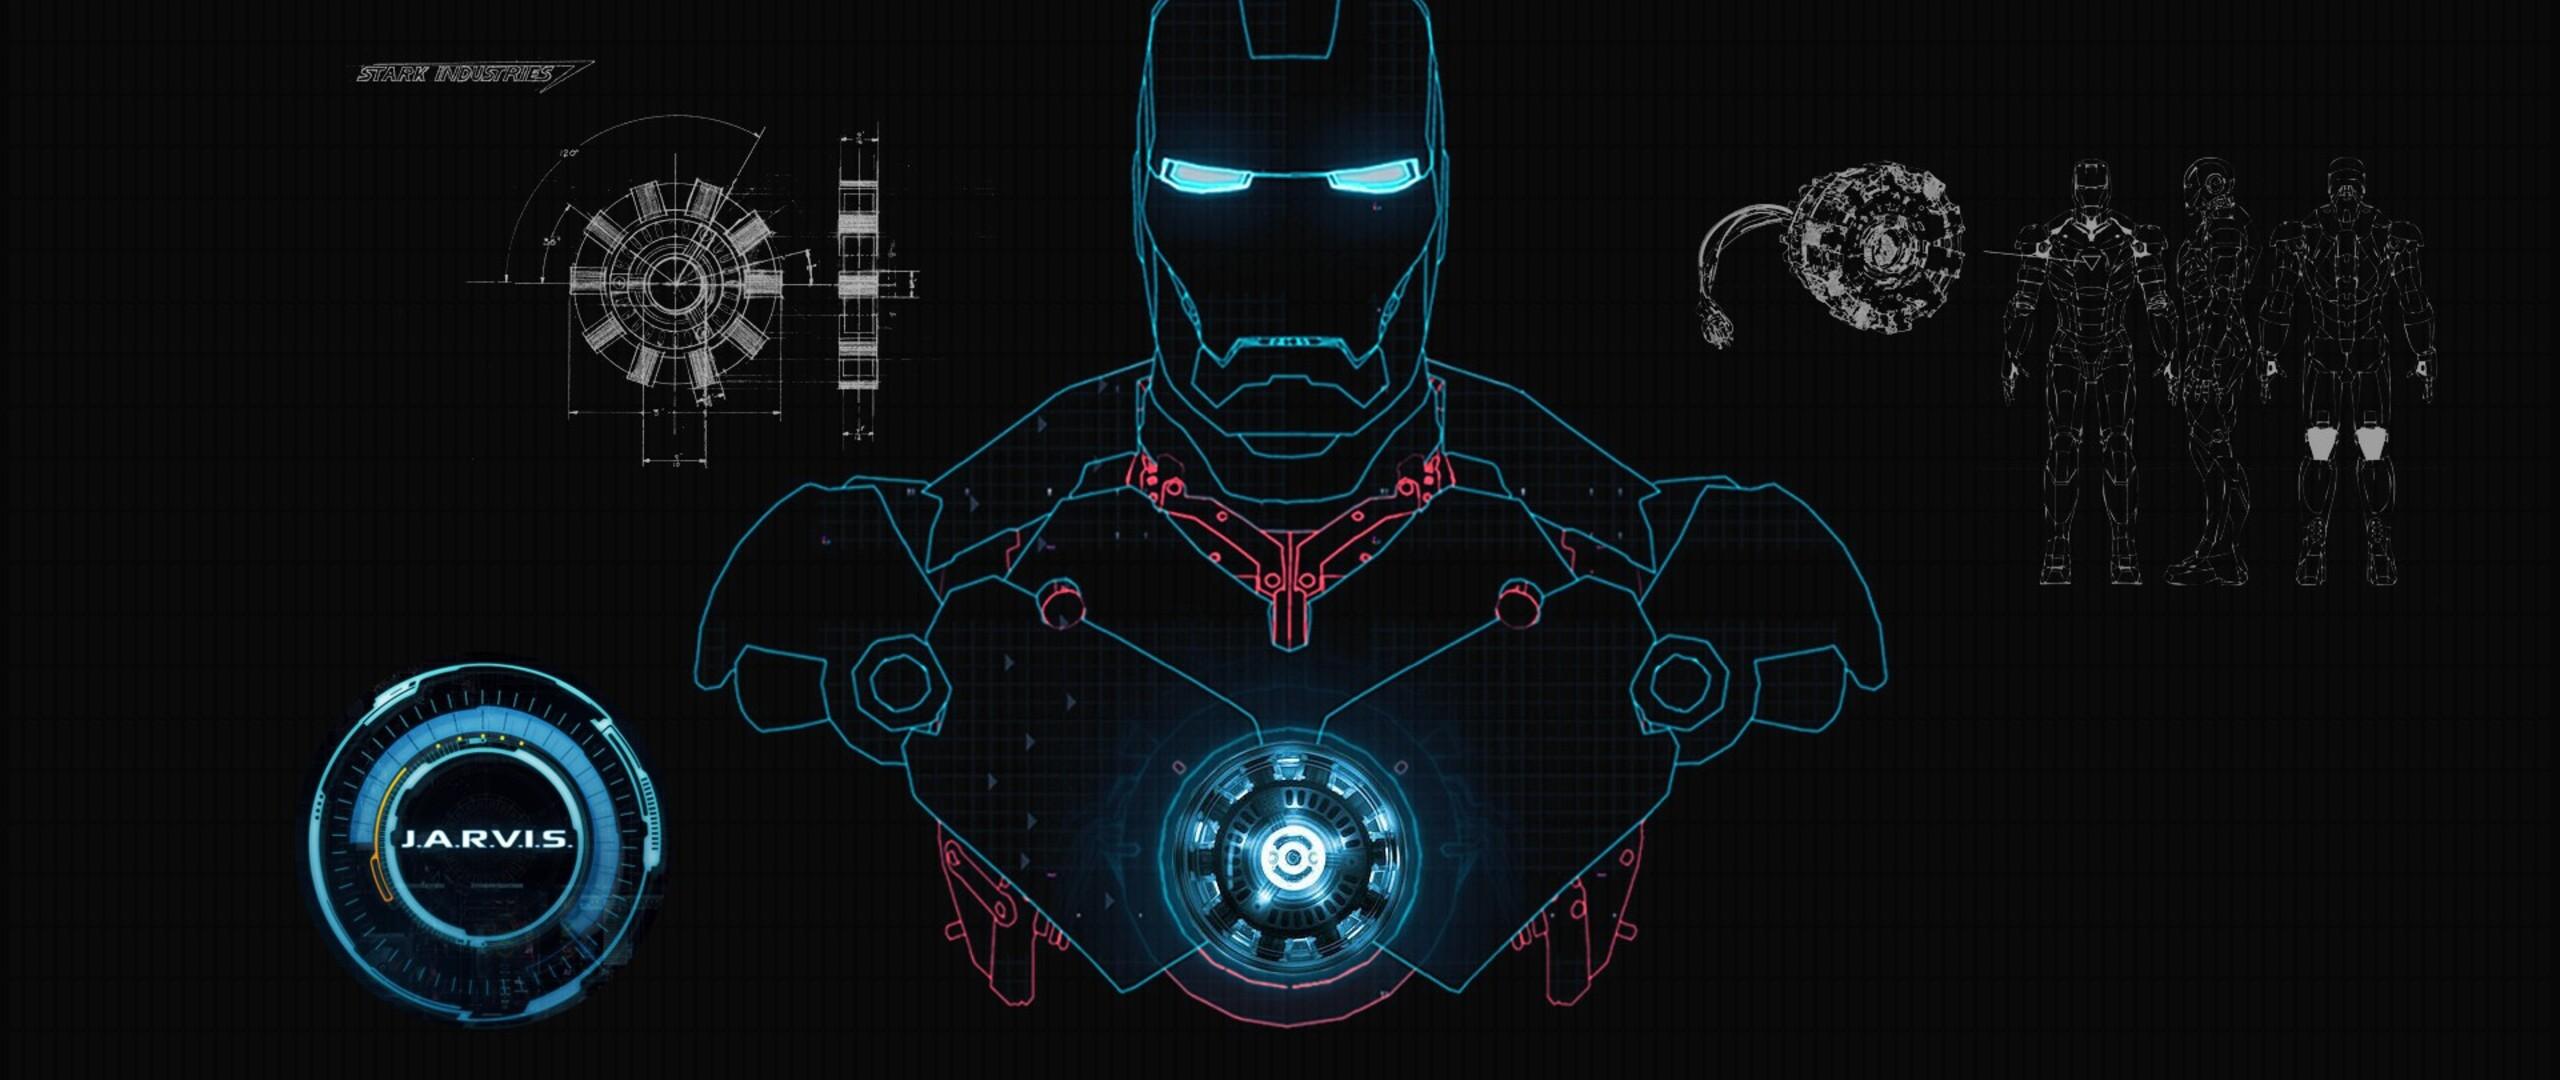 2560x1080 iron man art 2560x1080 resolution hd 4k for Sfondi iron man